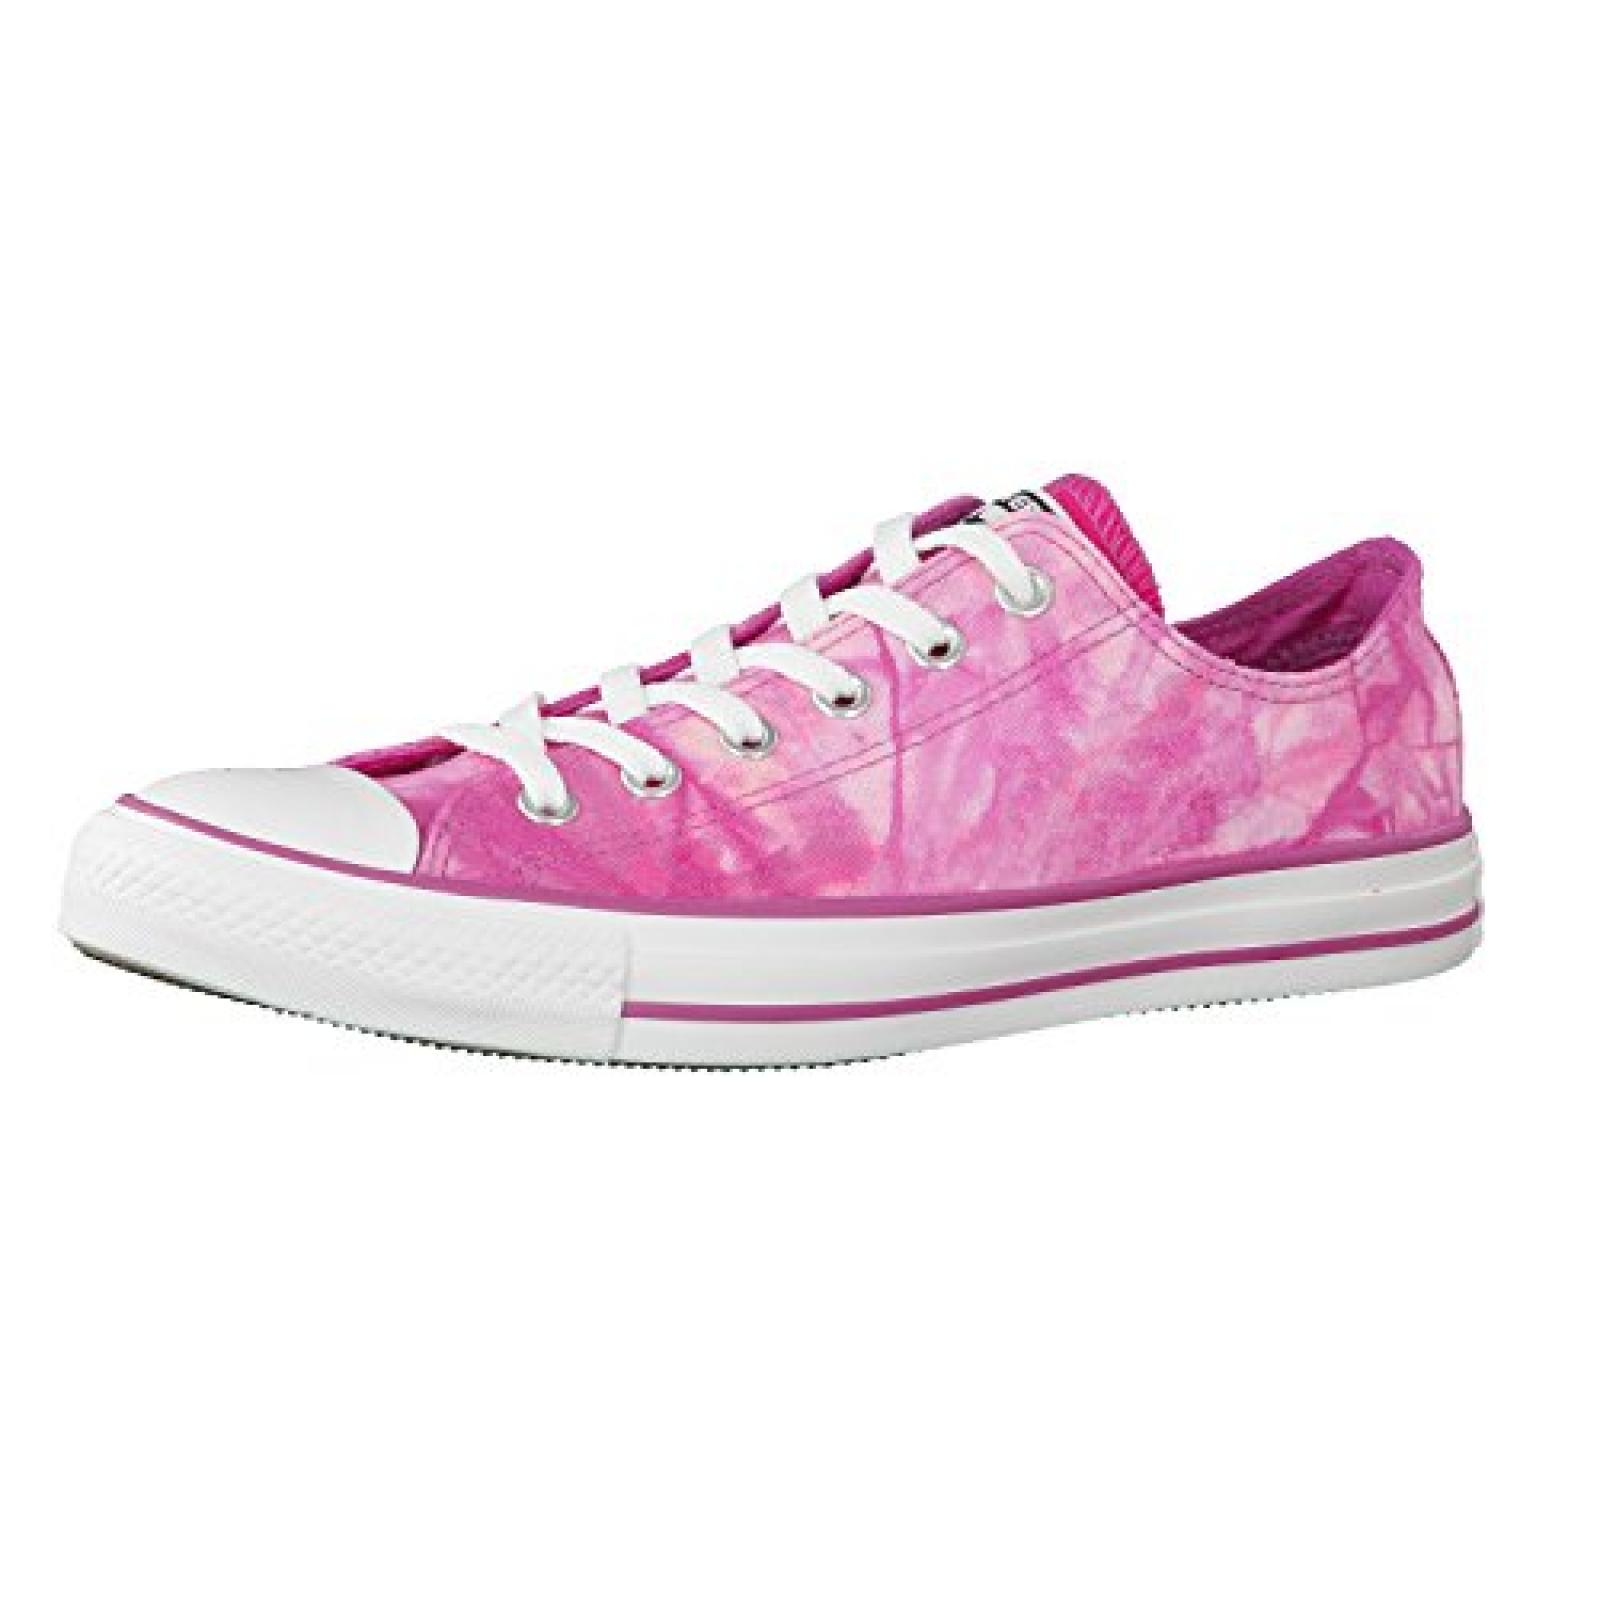 Converse Chuck Taylor All Star Tie Dye Sneaker